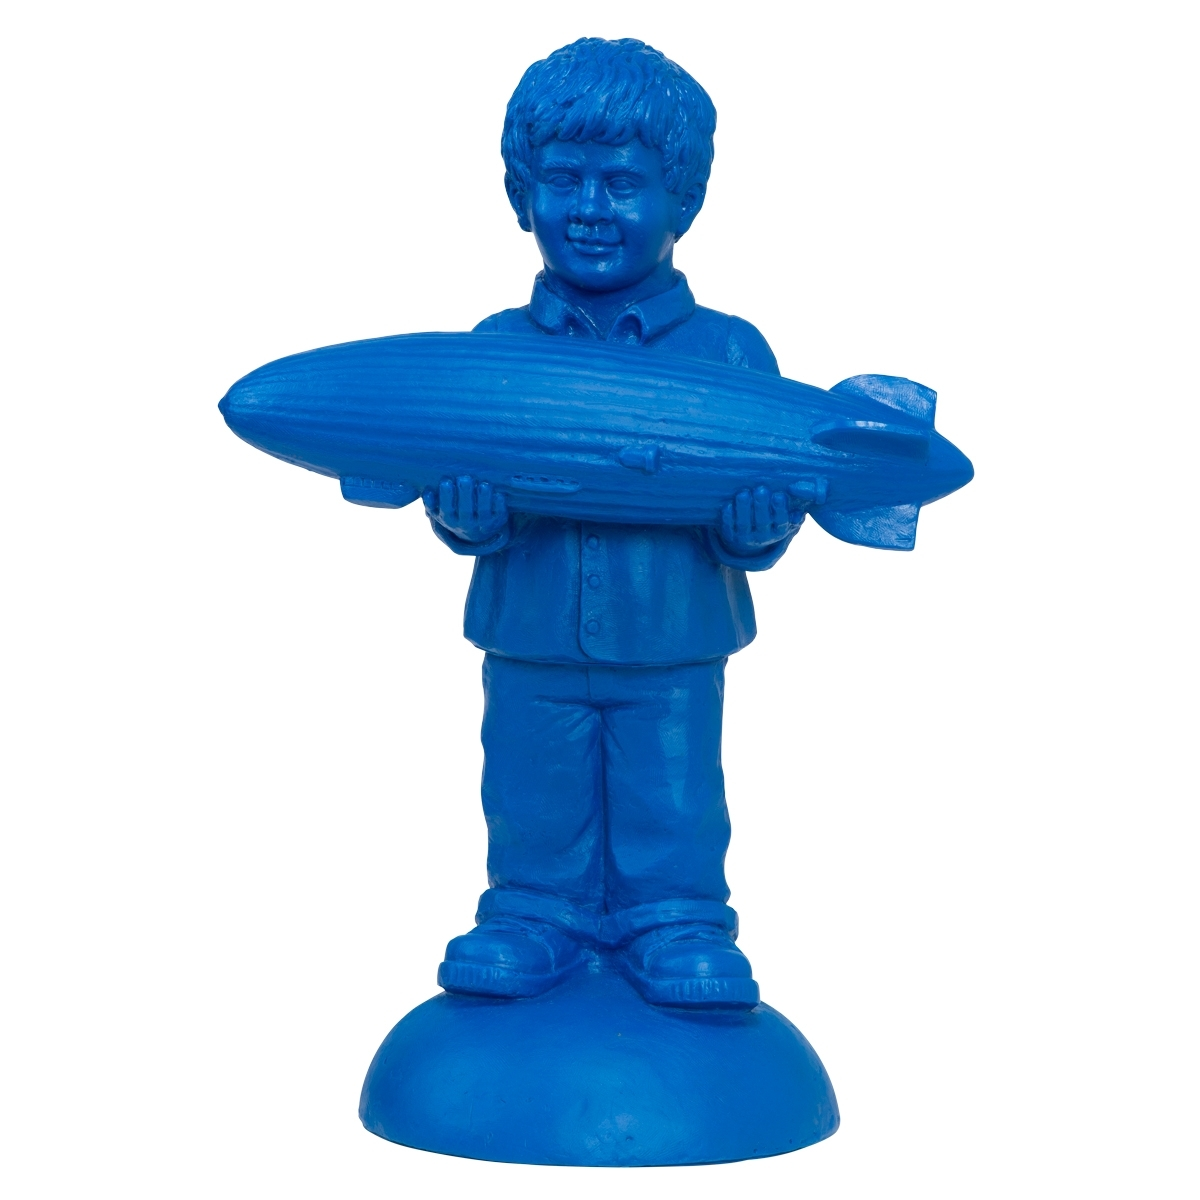 Zeppelin-Junge, blau - signiert